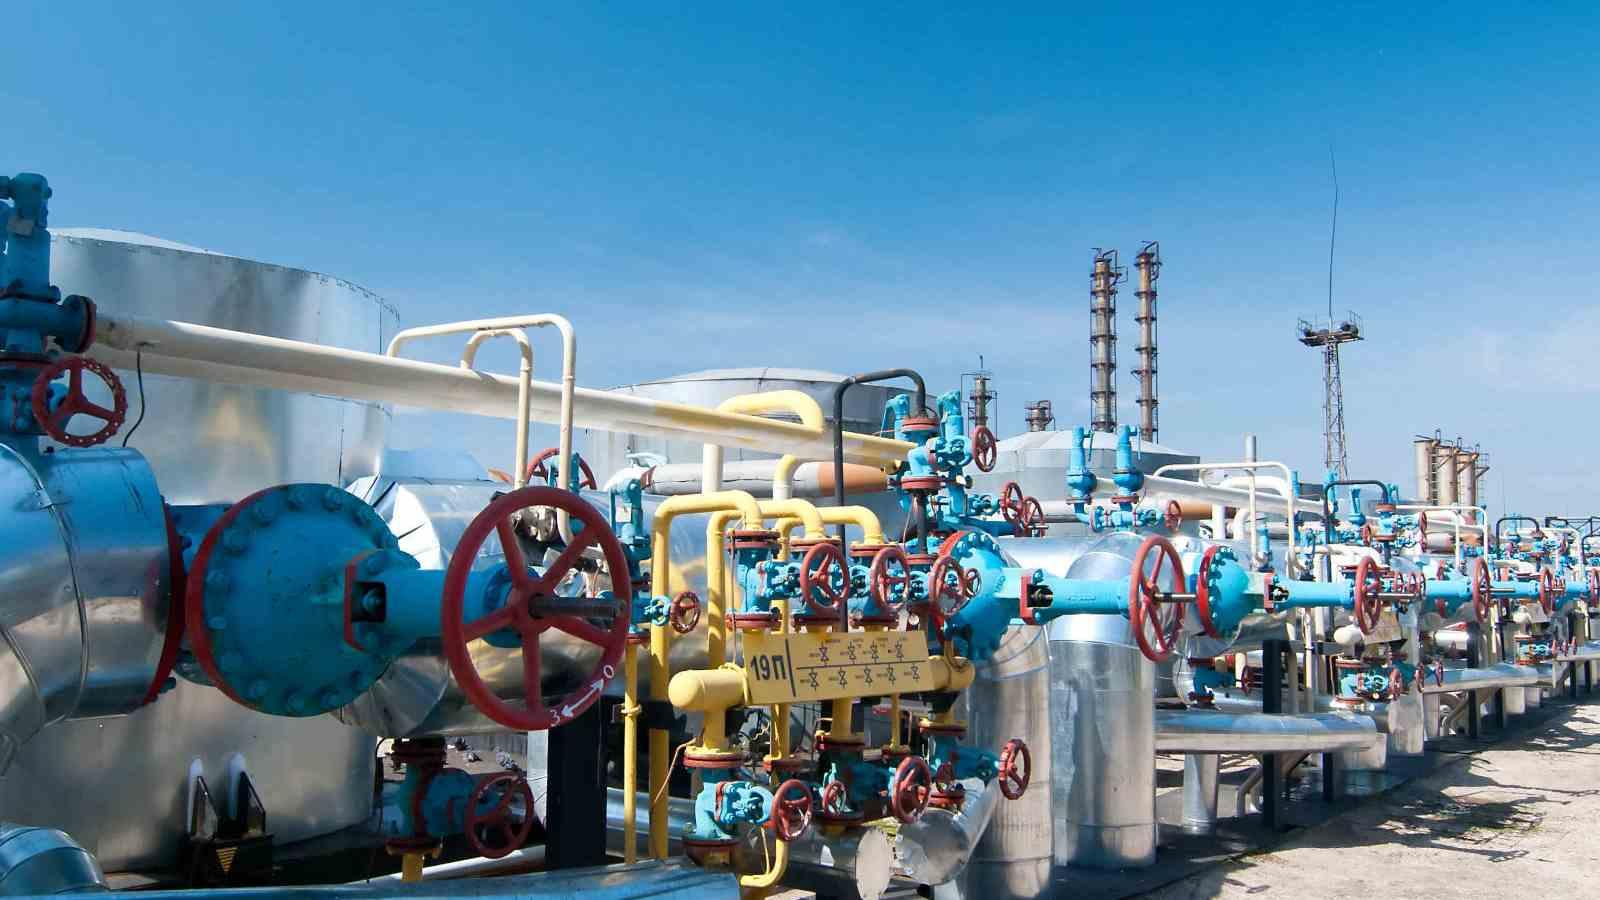 SmartBrains-Control-valve-sizing-selection-maintenance-online-workshop-training-certification-coursenoida-mumbai-chennai-dehradun-pune-sudan-south-africa-dubai